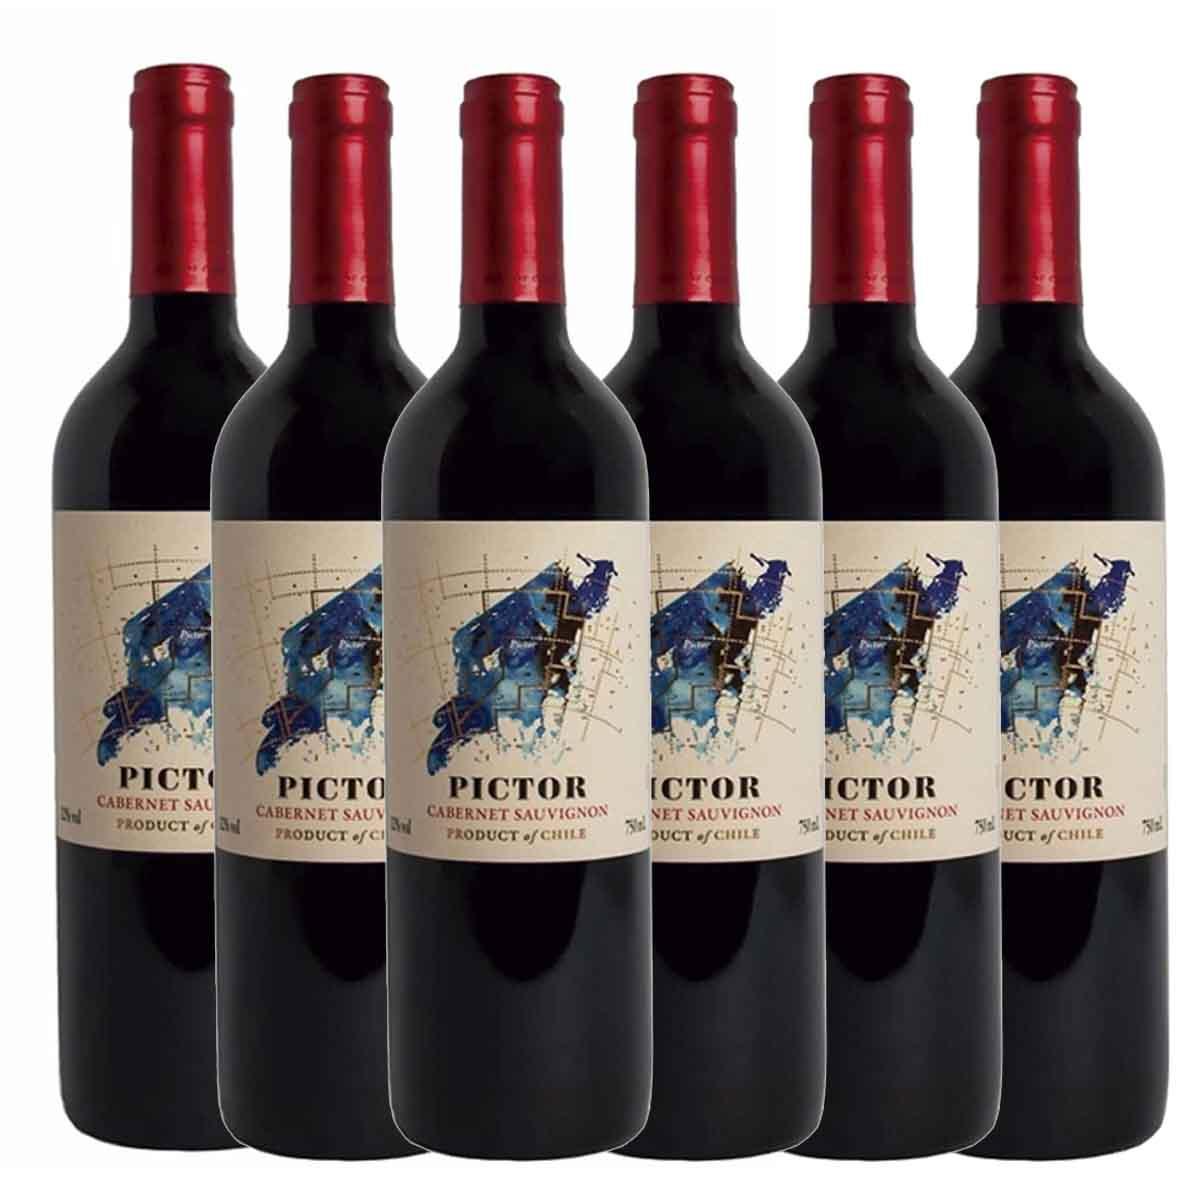 Kit 6x Vinho Tinto Chileno Pictor Cabernet Sauvignon 2018